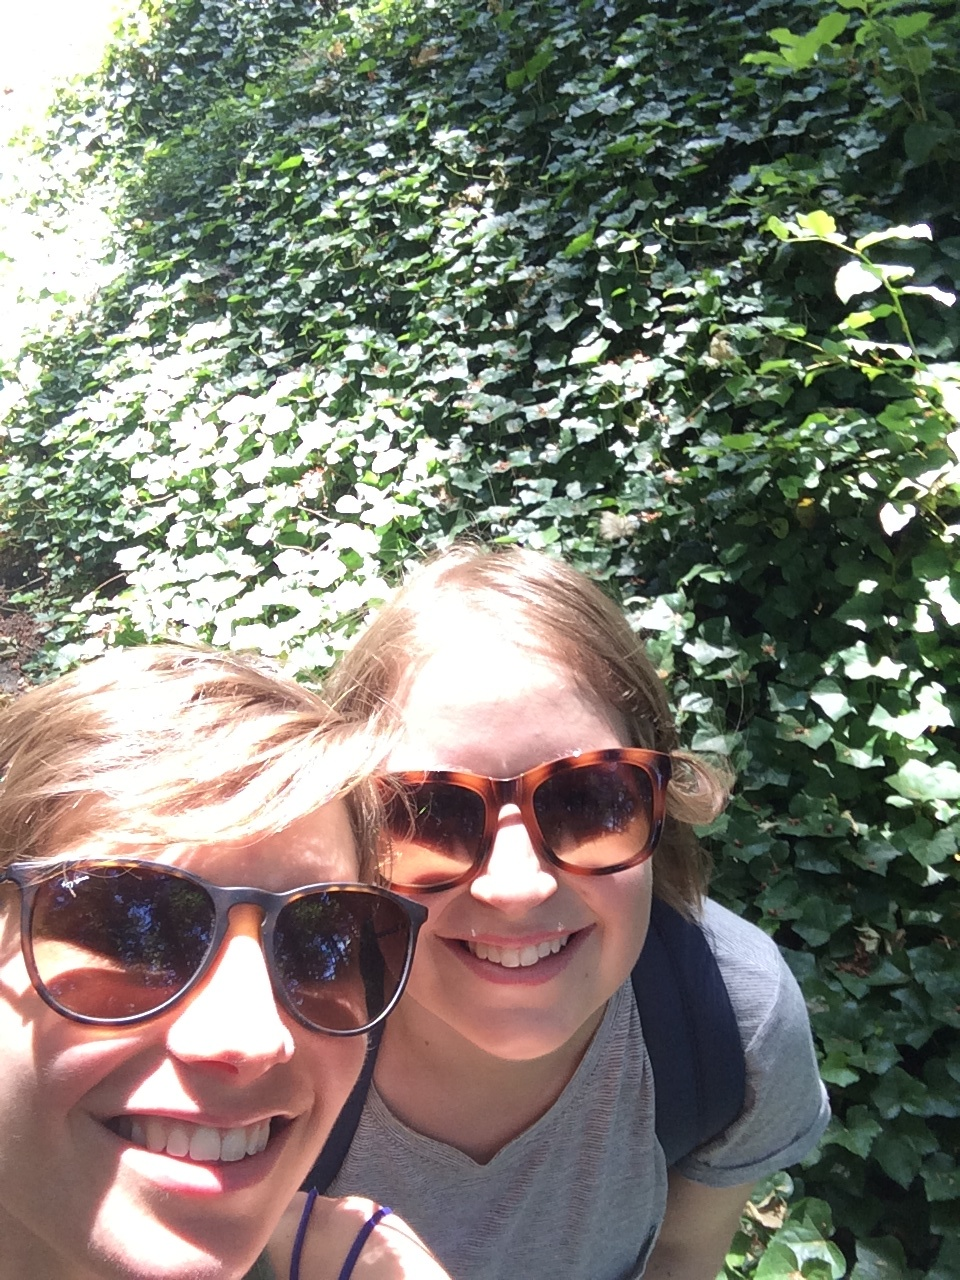 Our first day we walked through Portland's International Test Rose Garden